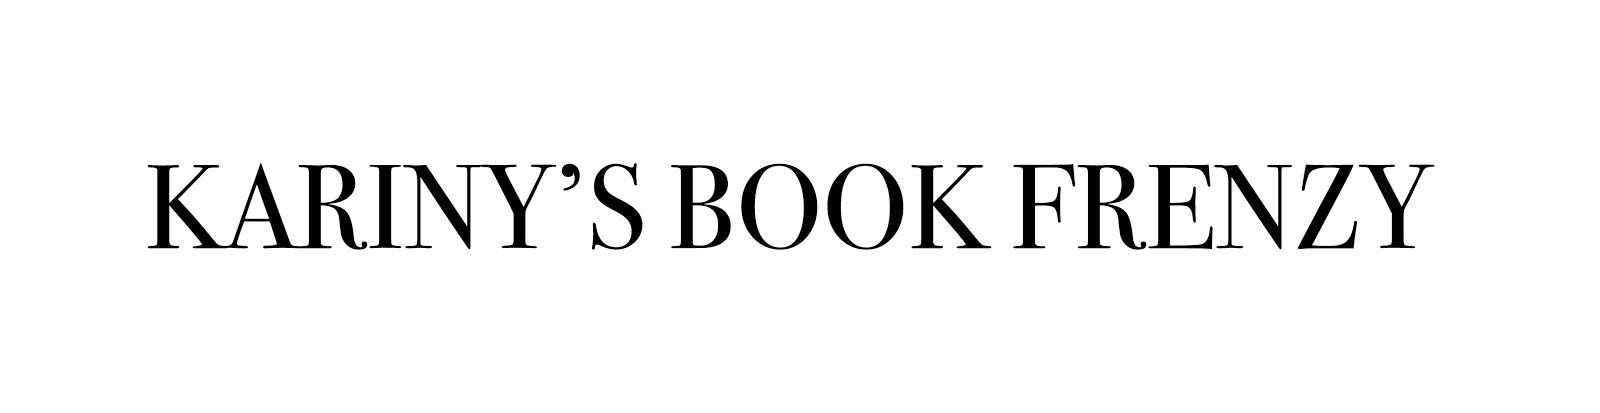 kariny's book frenzy